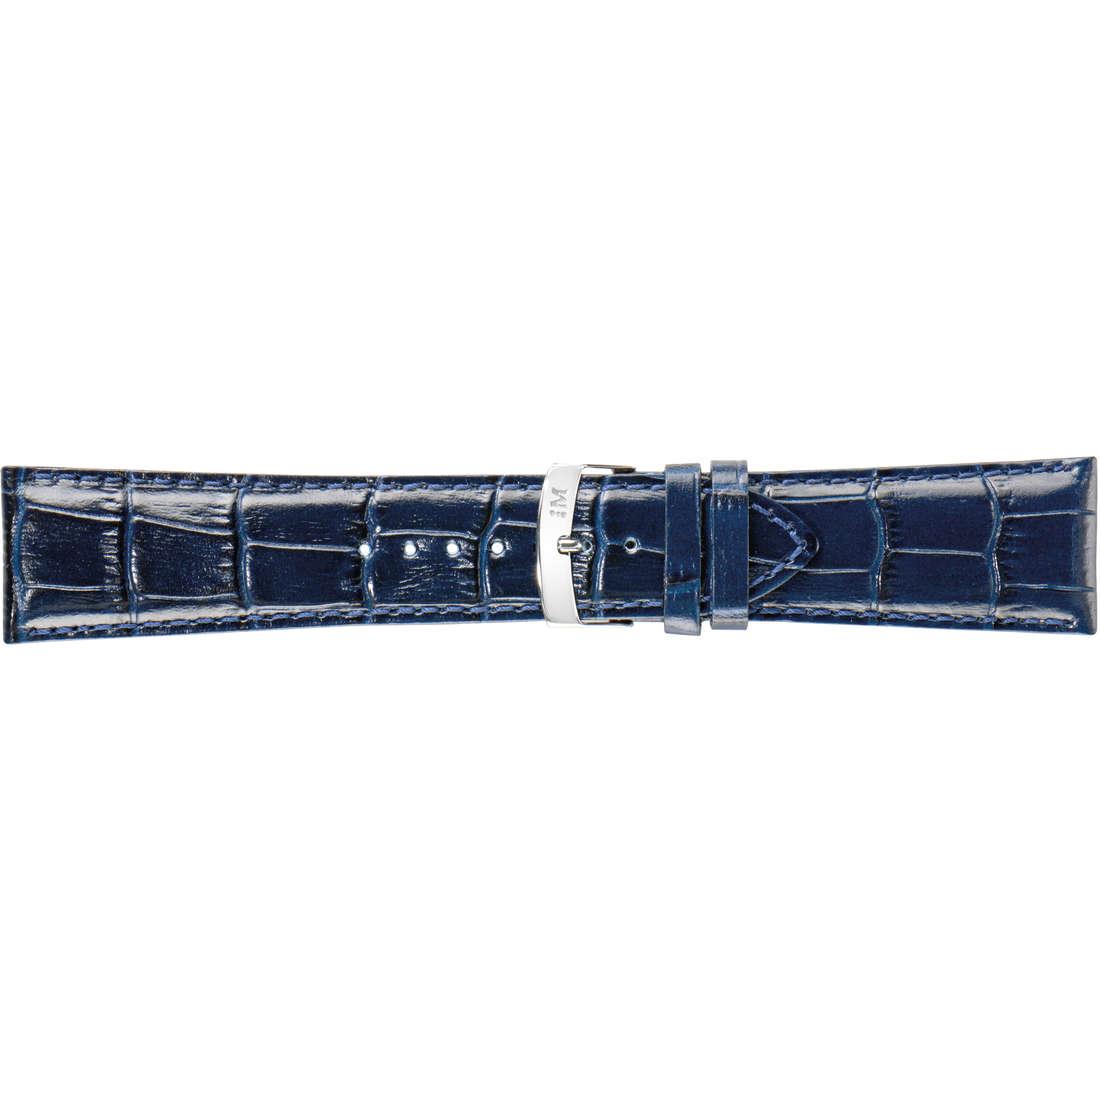 watch watch bands watch straps man Morellato Morellato 1930 A01X3395656062CR26